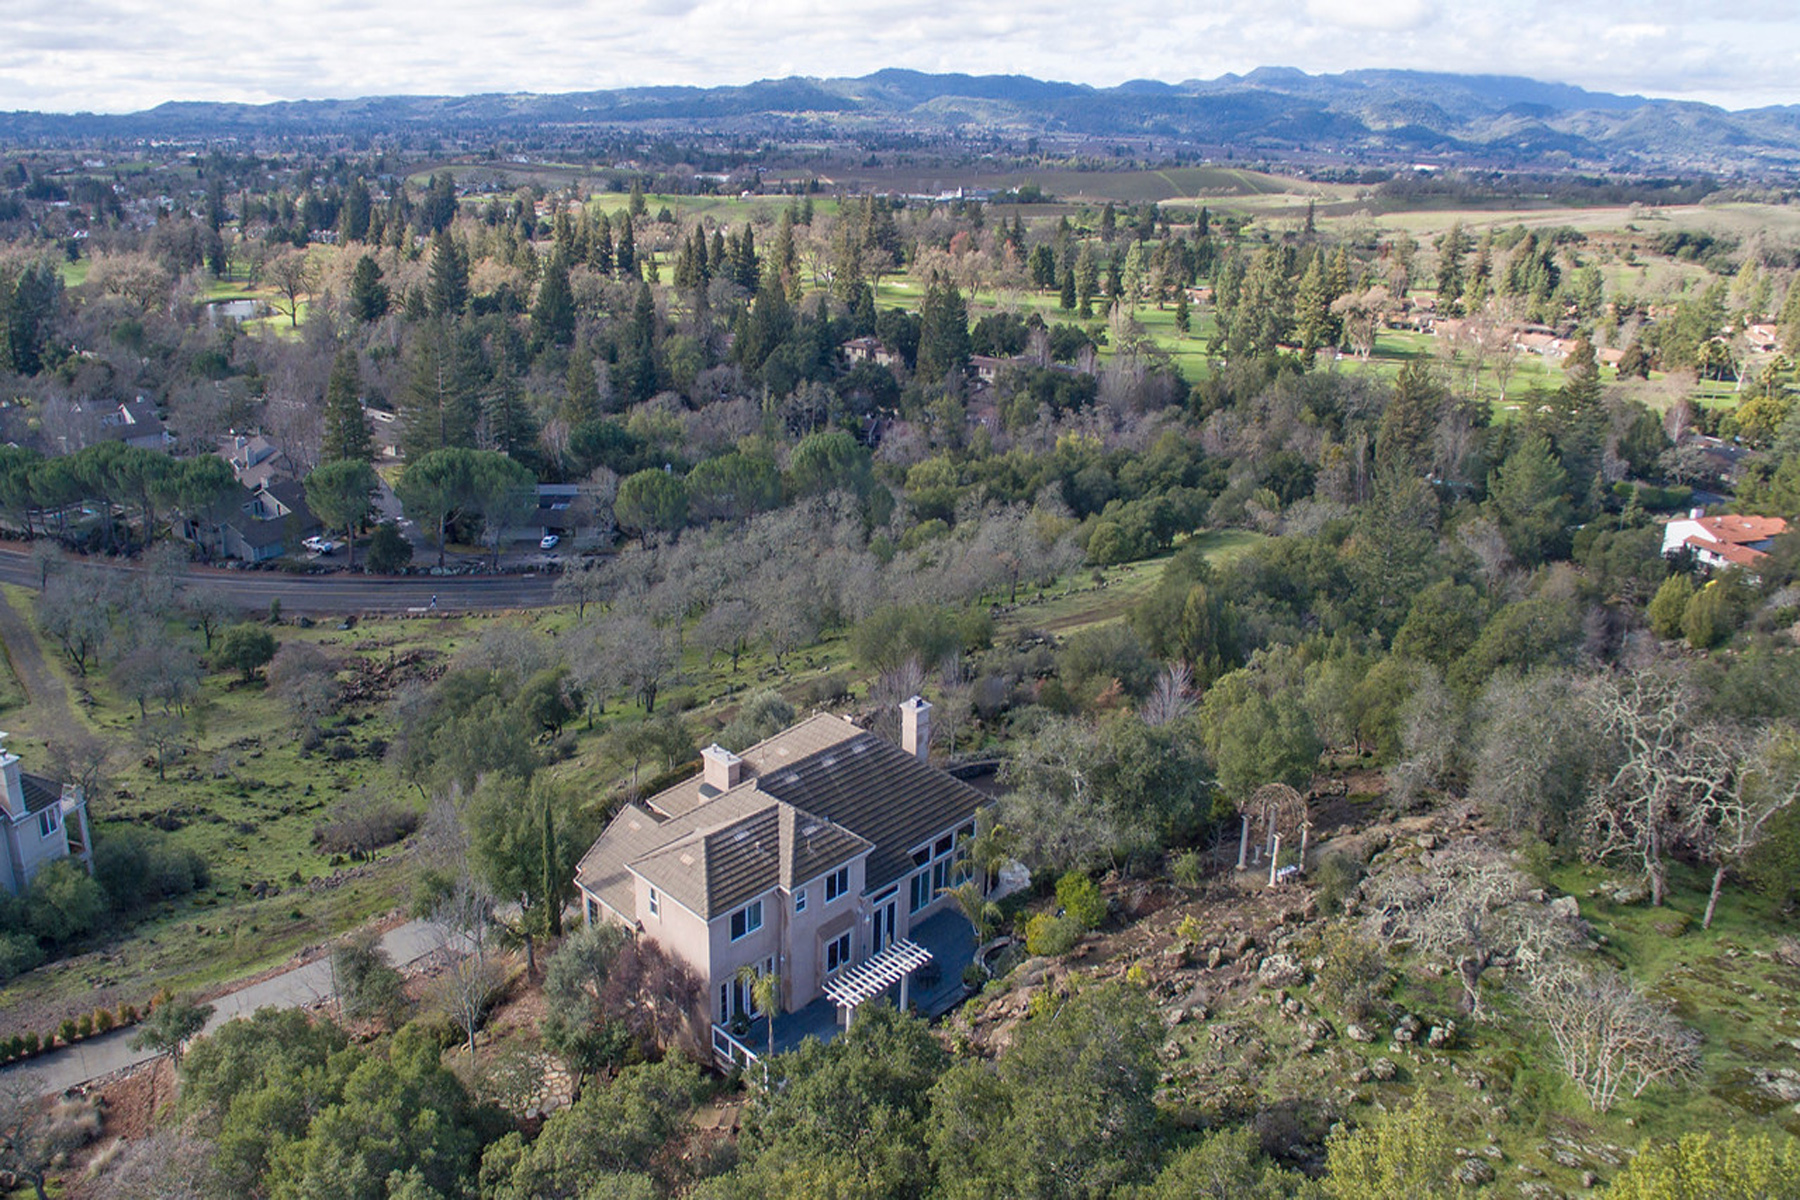 Property For Sale at 1131 Castle Oaks Dr, Napa, CA 94558